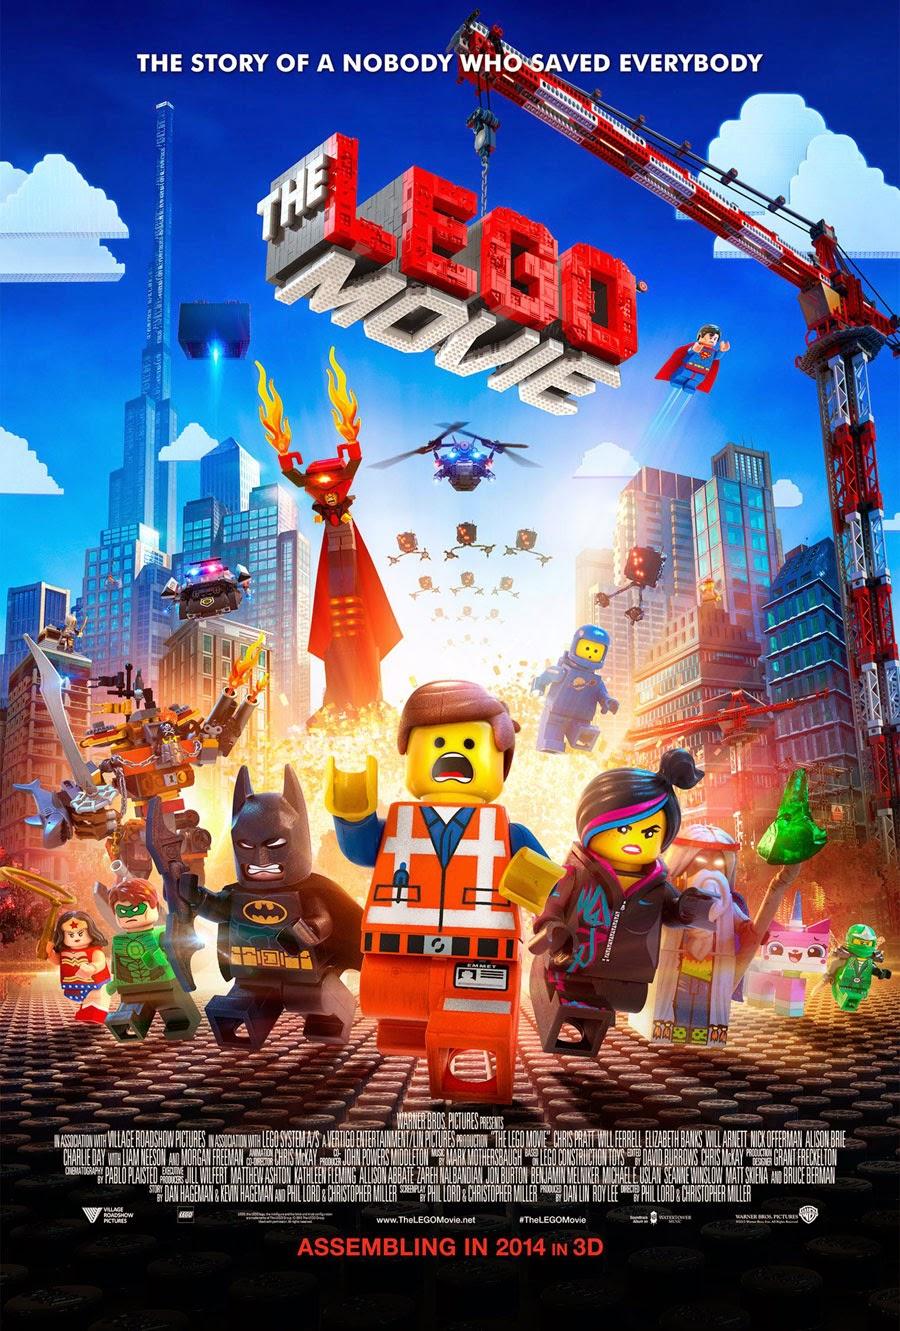 la lego película, emmett, lego, batman, vitruvius, poster, el zorro con gafas